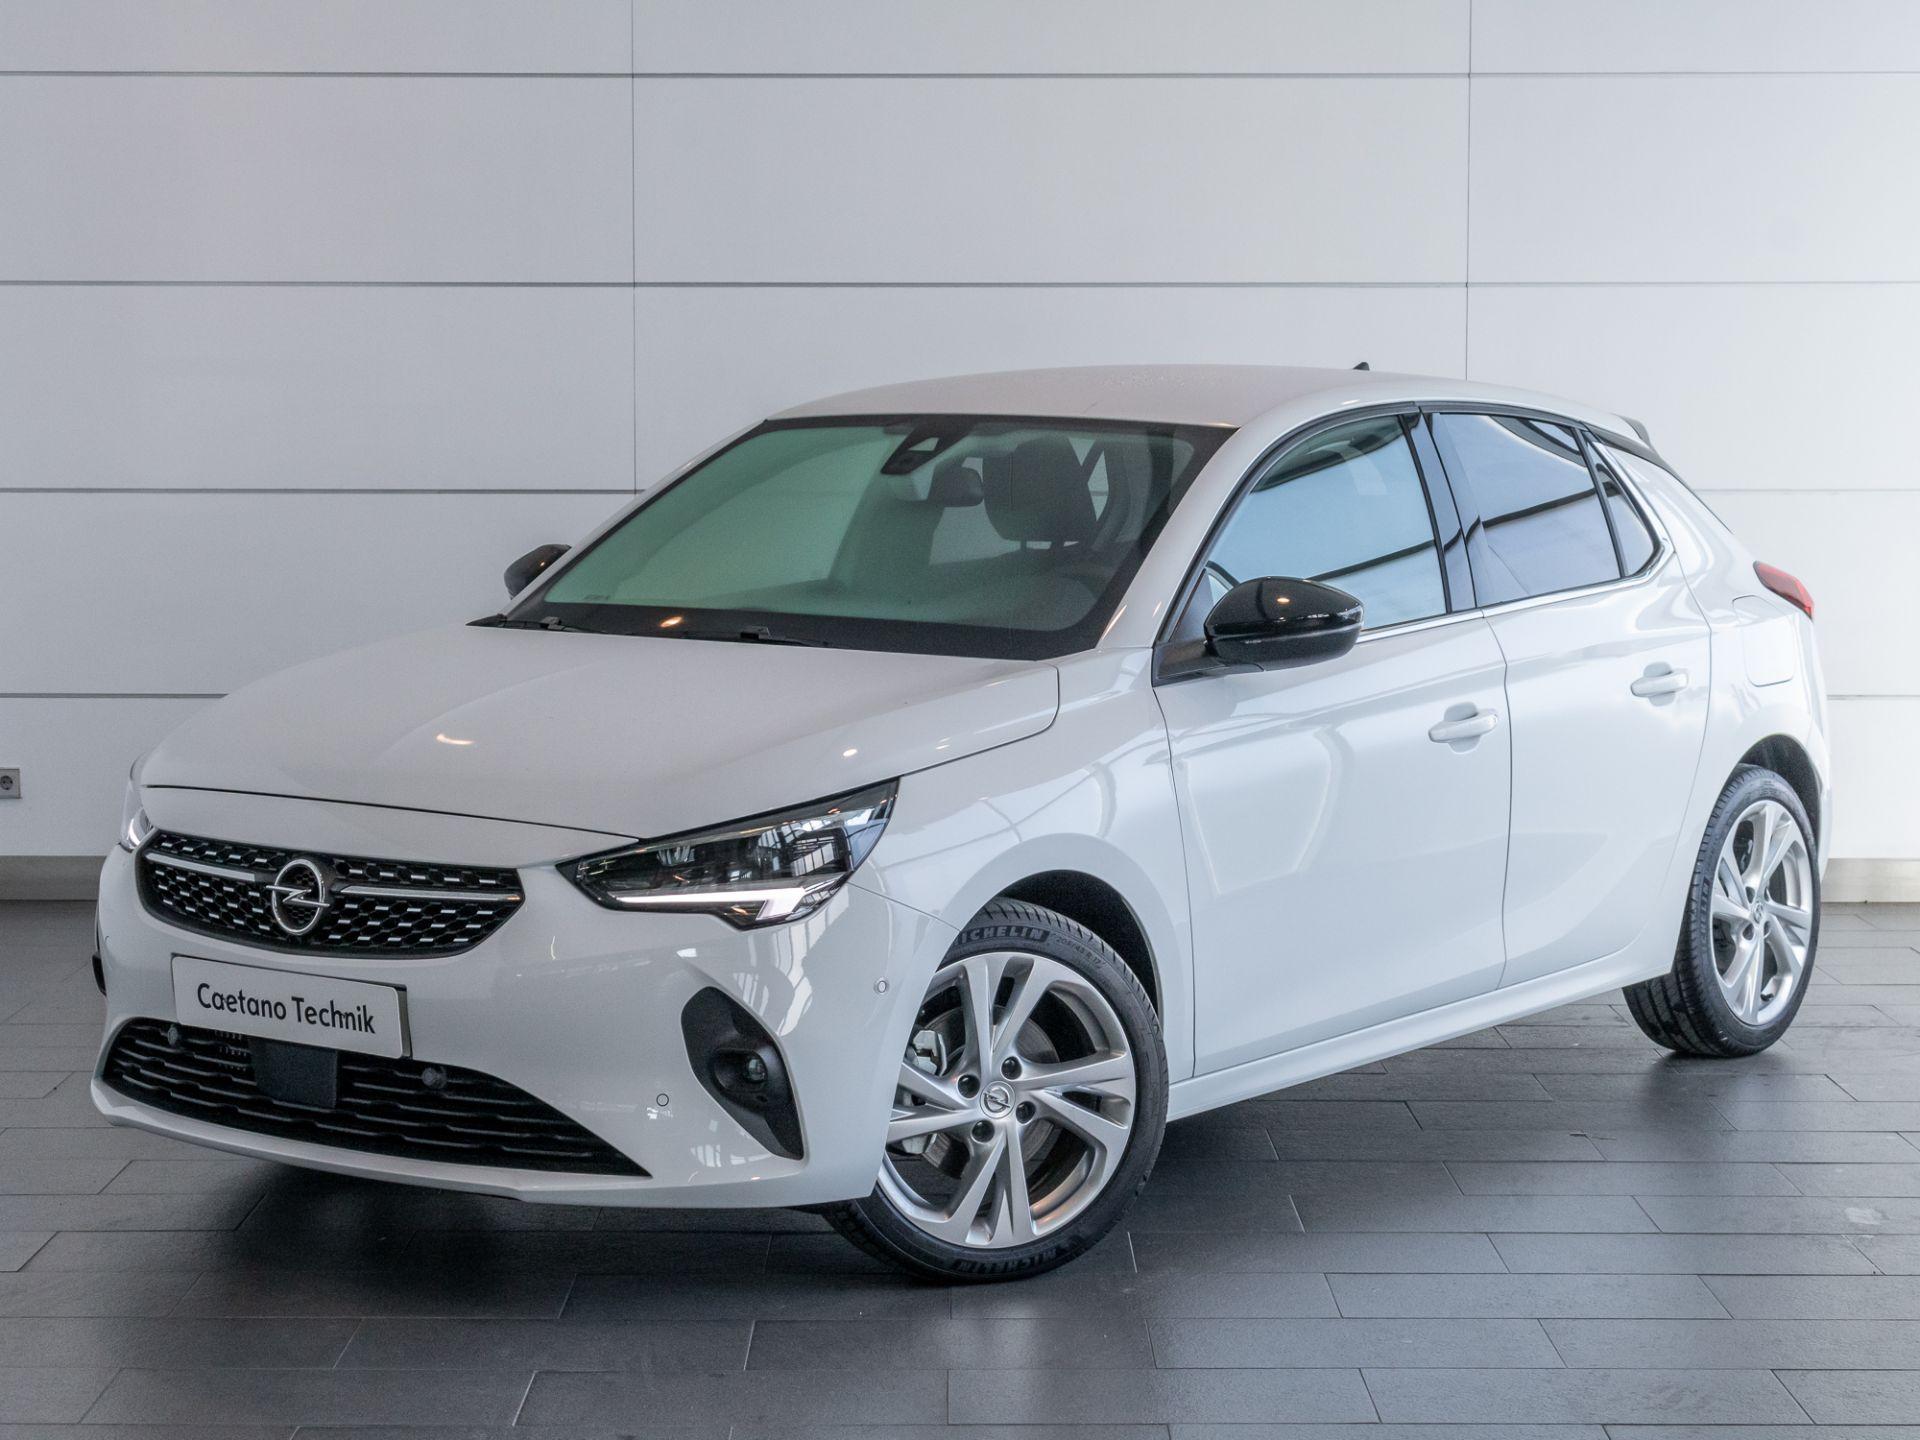 Opel Corsa 1.5D 100cv Elegance usada Setúbal